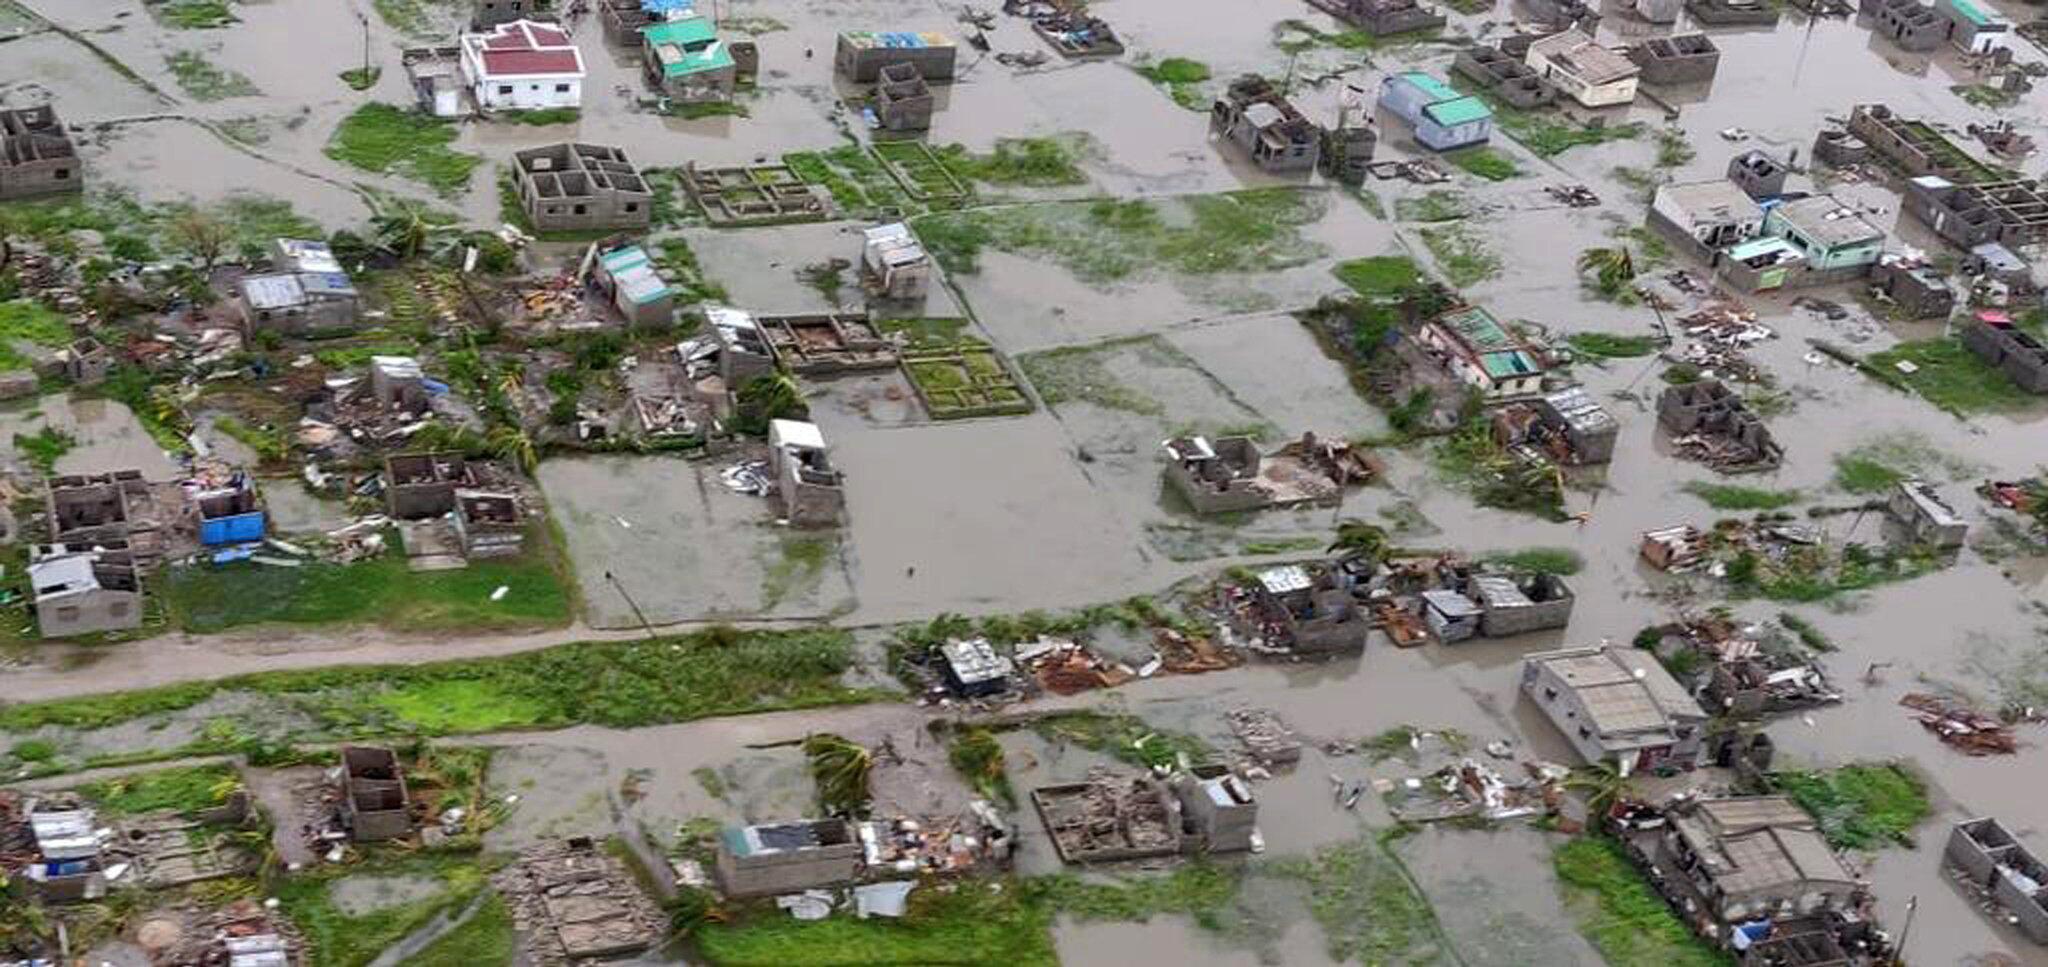 Bild zu Zyklon in Mosambik